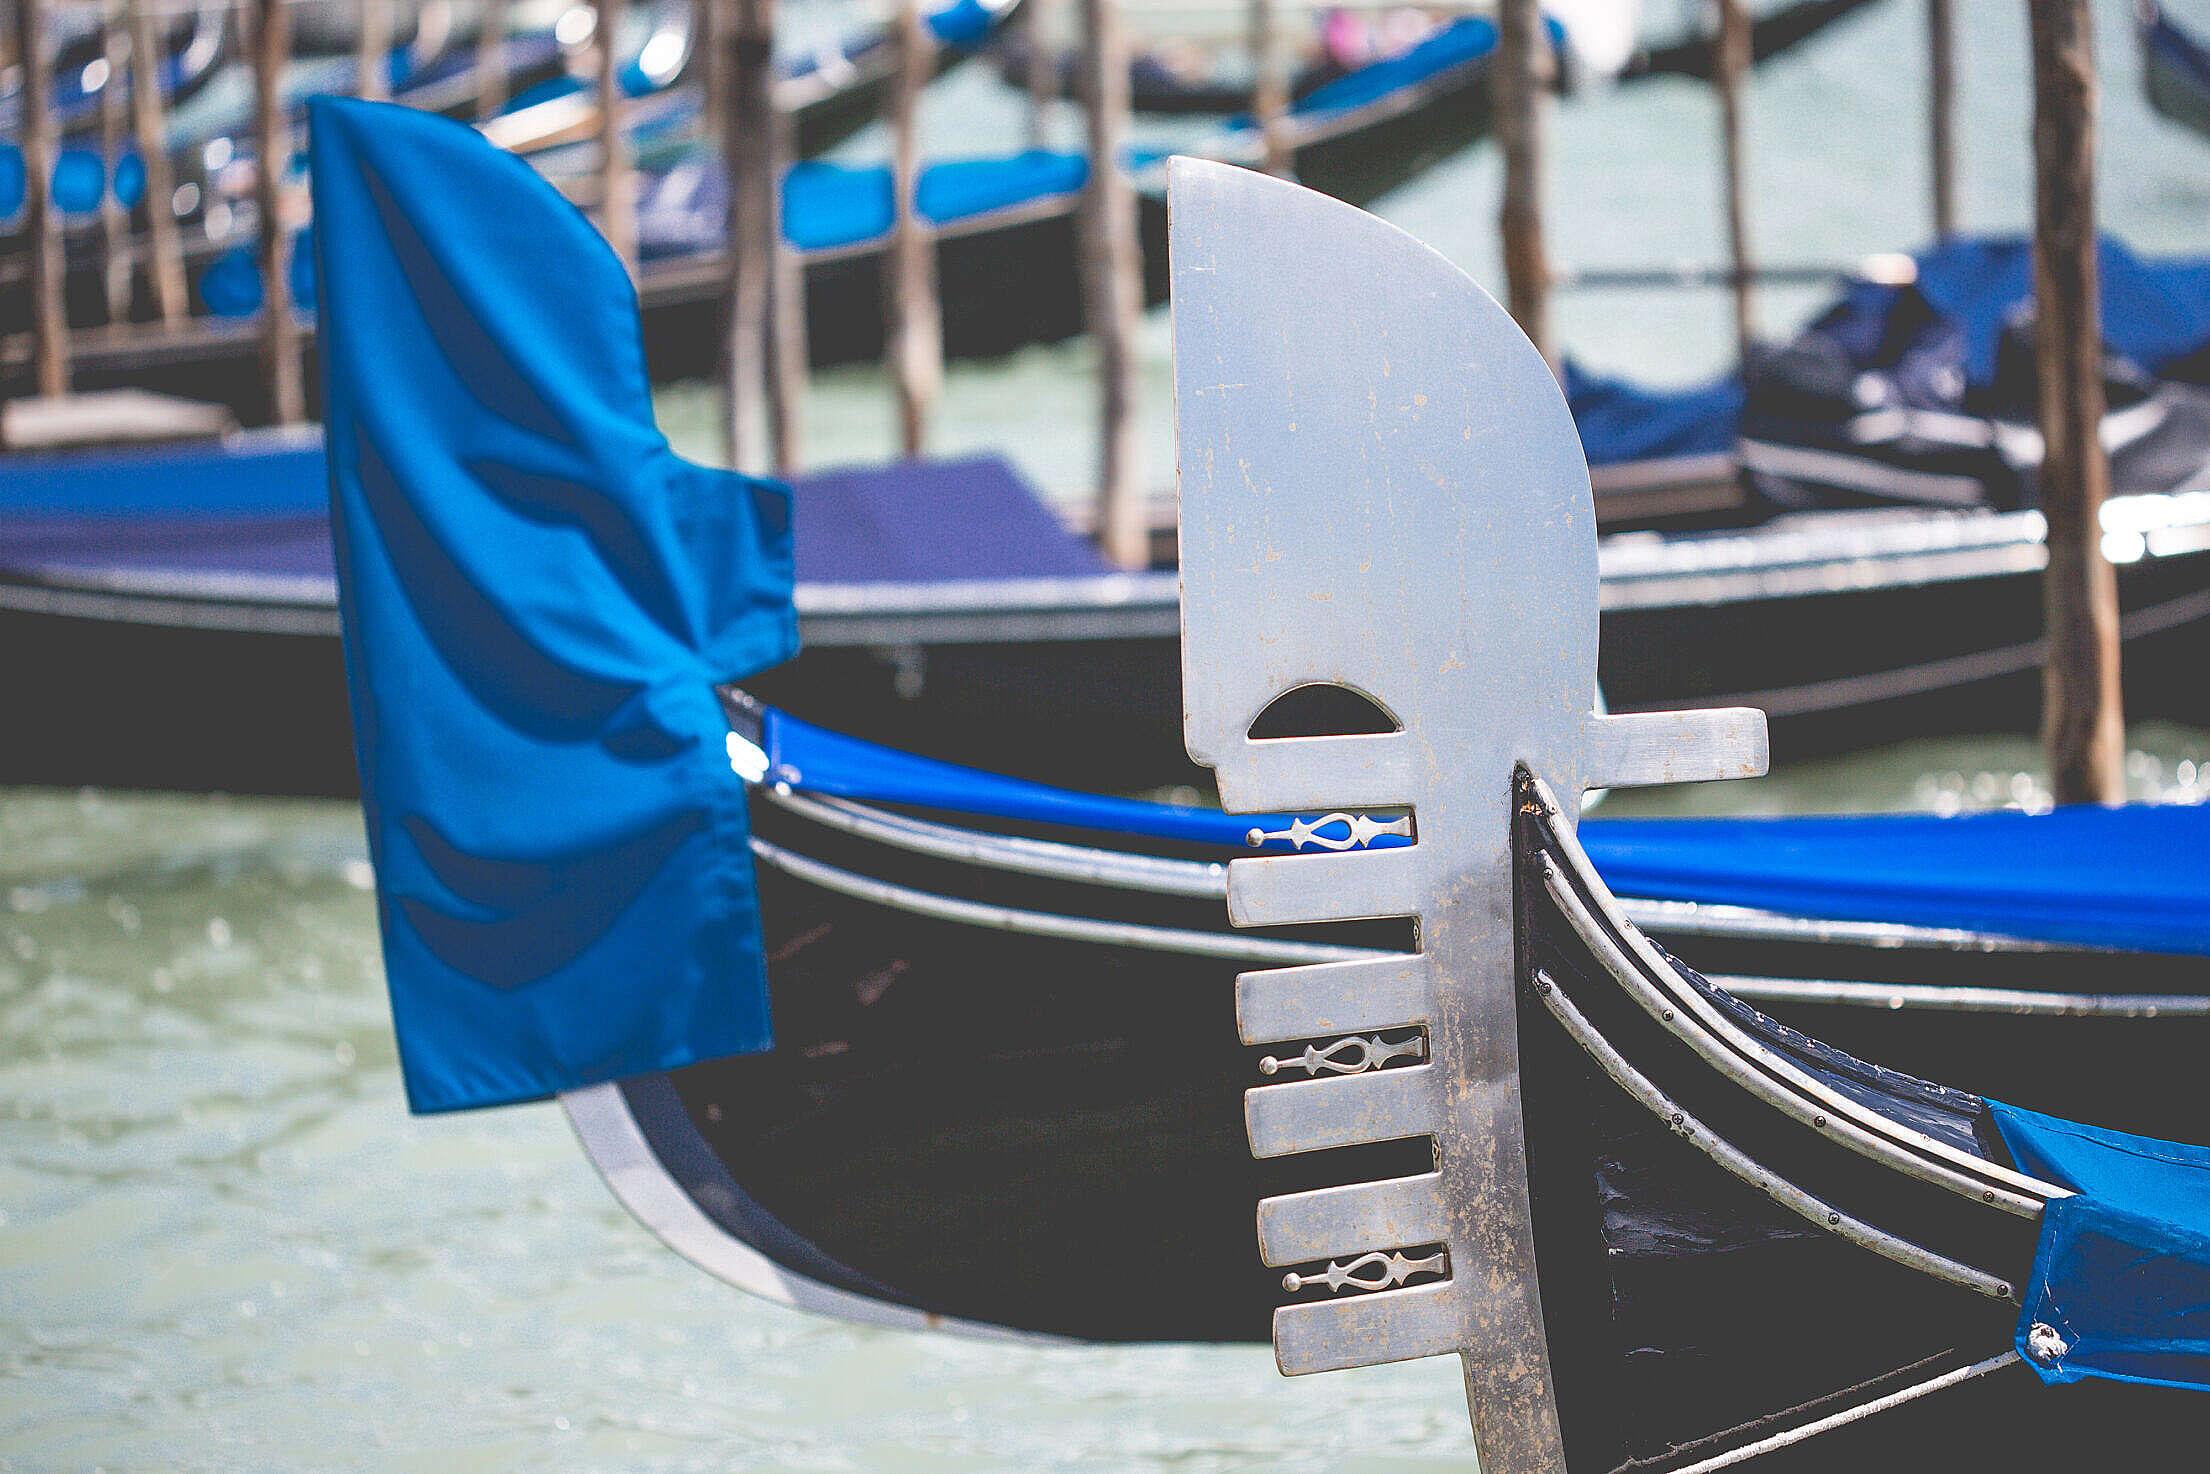 Ferro — Gondola Bow Ornament Free Stock Photo